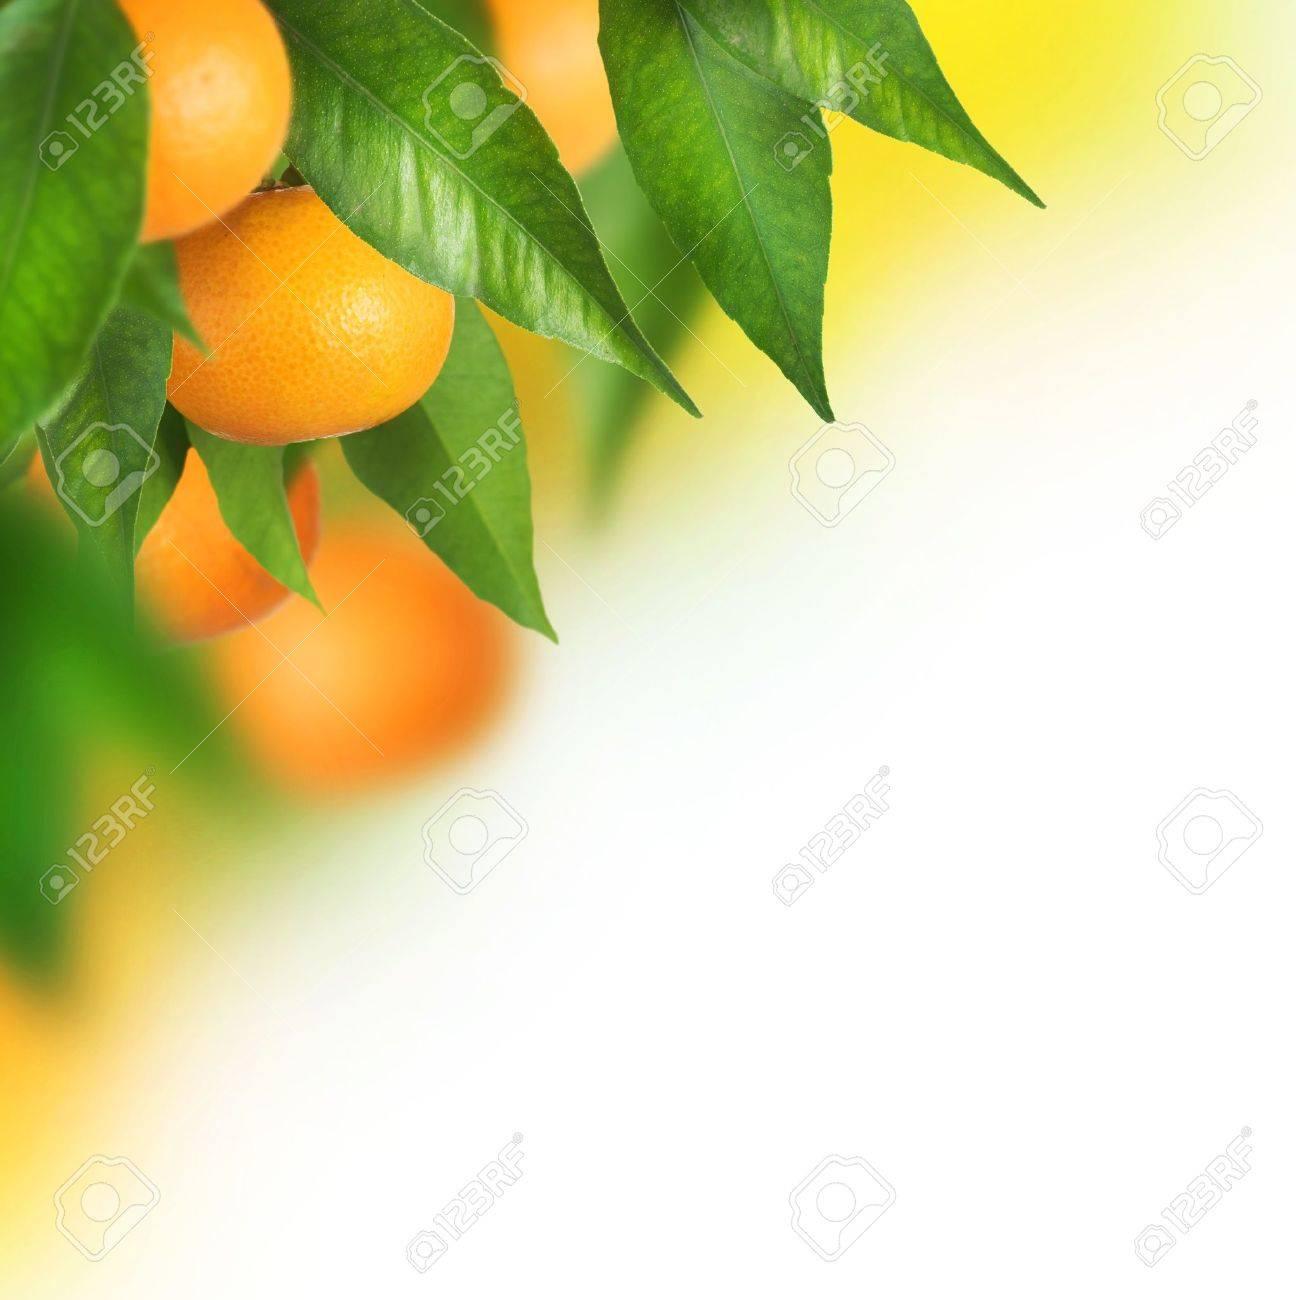 Ripe Tangerines growing.Border design Stock Photo - 9082693